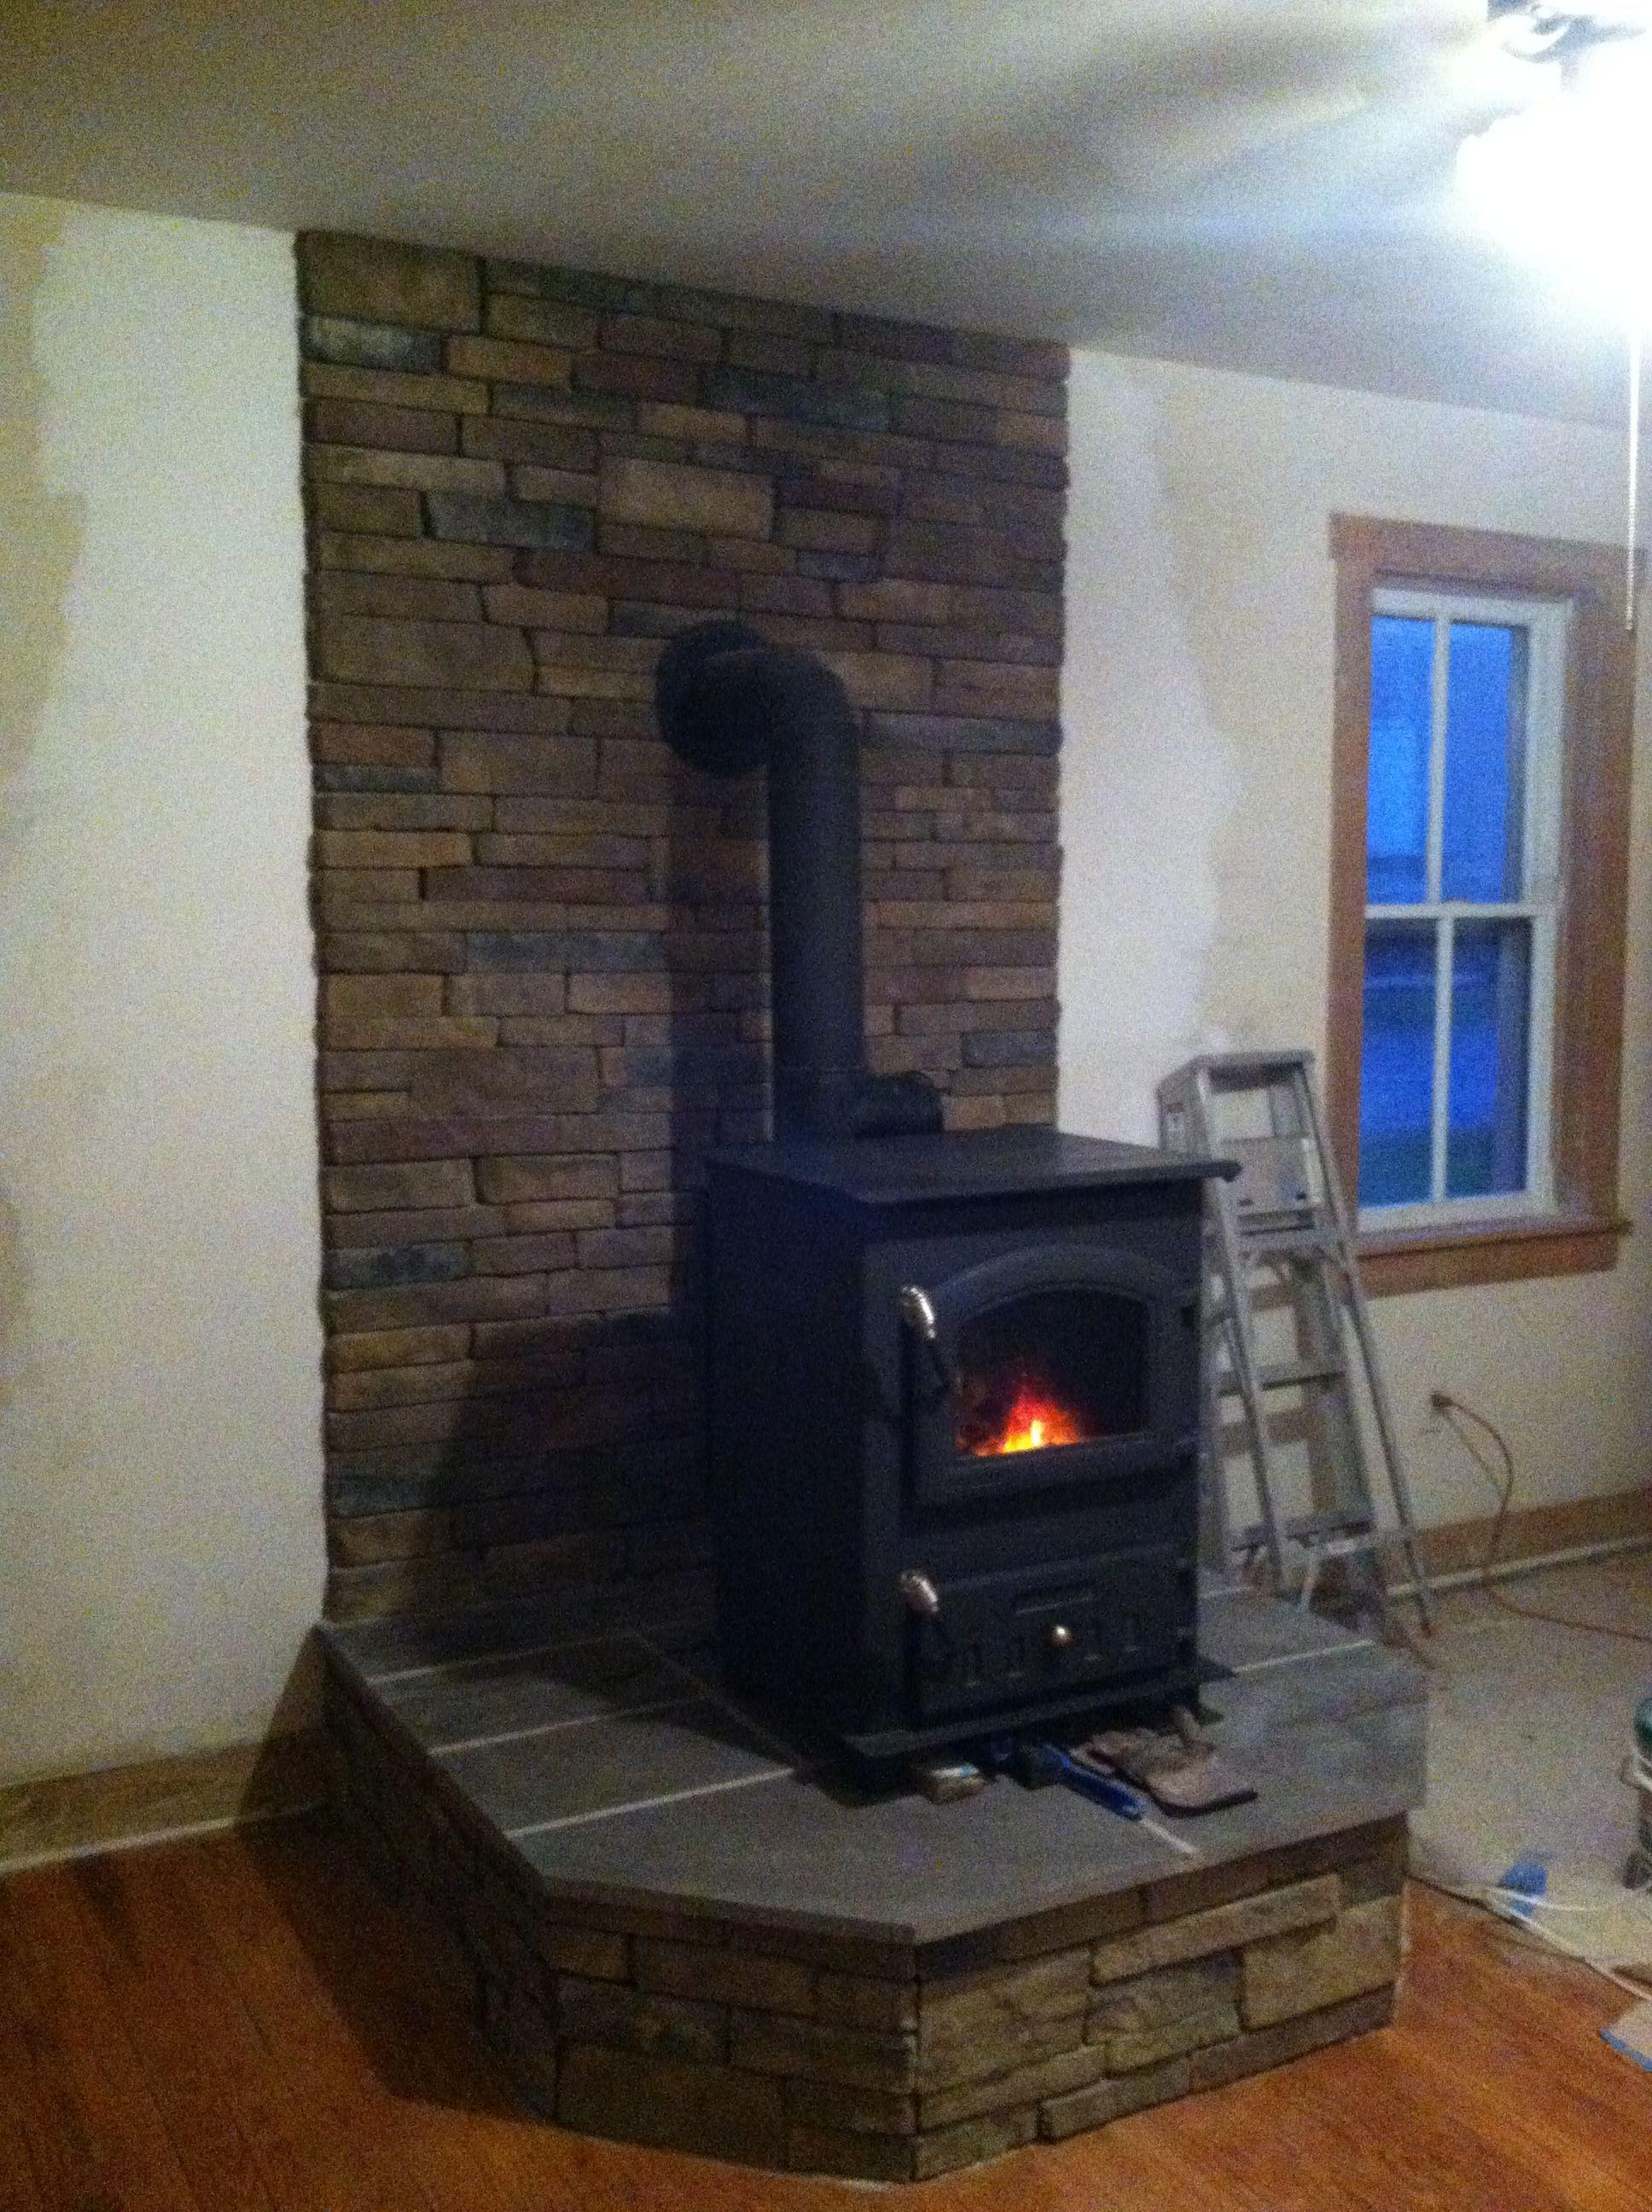 Raised Flagstone Hearth With Wood Stove Wood Stove Hearth Wood Stove Wood Burning Stove